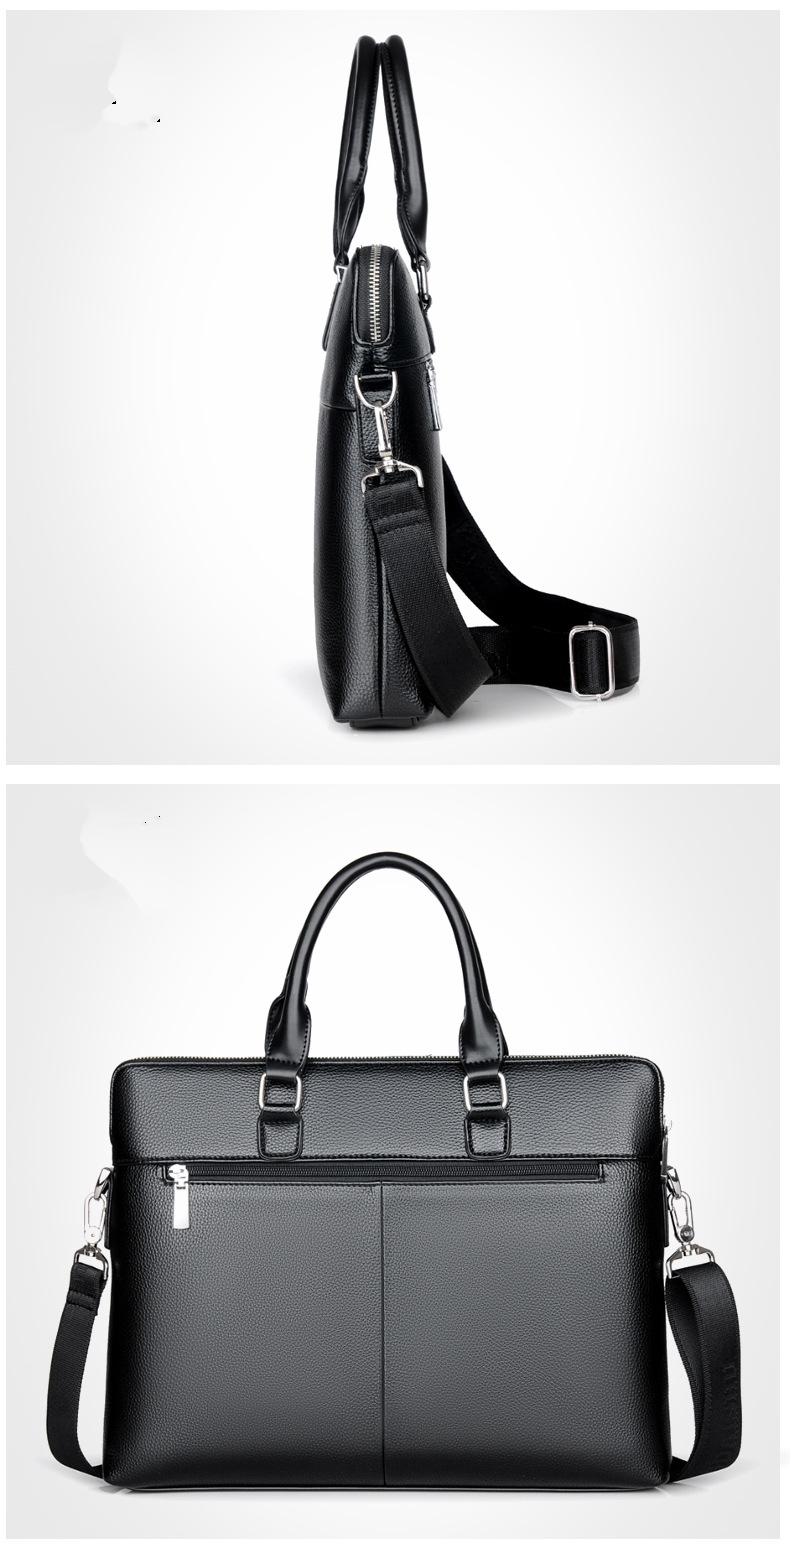 HTB1DDBegUcKL1JjSZFzq6AfJXXaL TIANHONGDAISHU Men Casual Briefcase Business Shoulder Leather Messenger Bags Computer Laptop Handbag Men's Travel Bags handbags